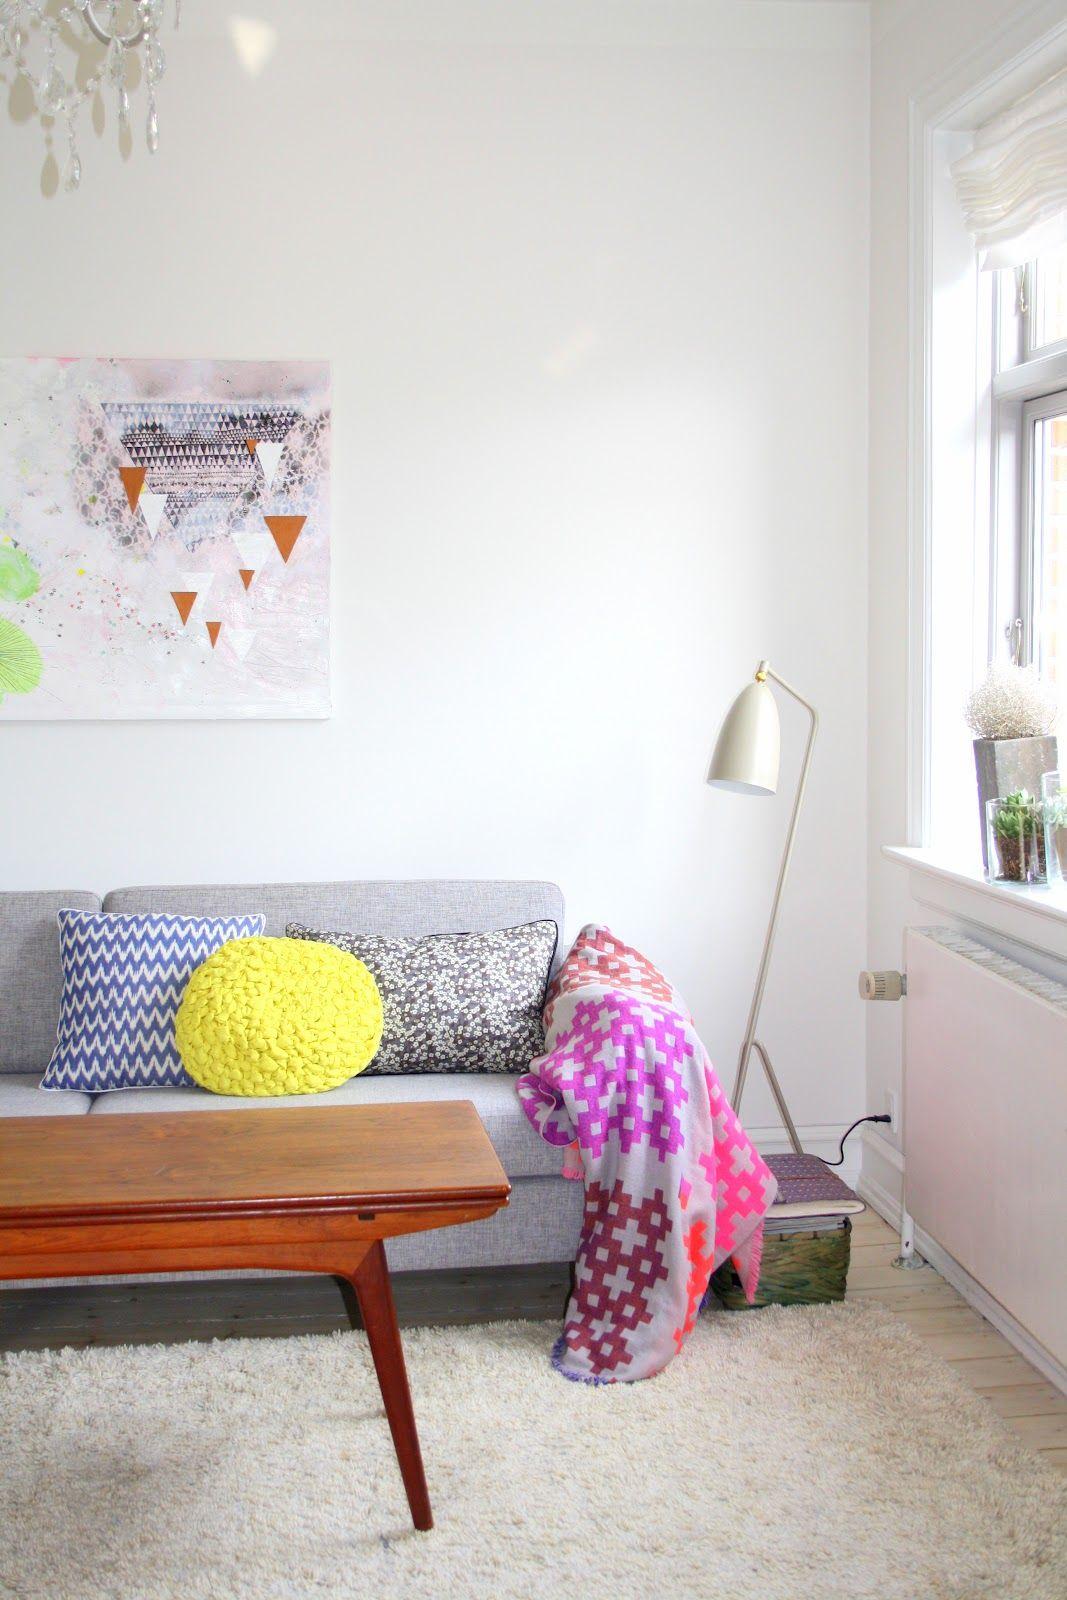 by.bak: No. 0278 - Vores stue har fået ny lampe